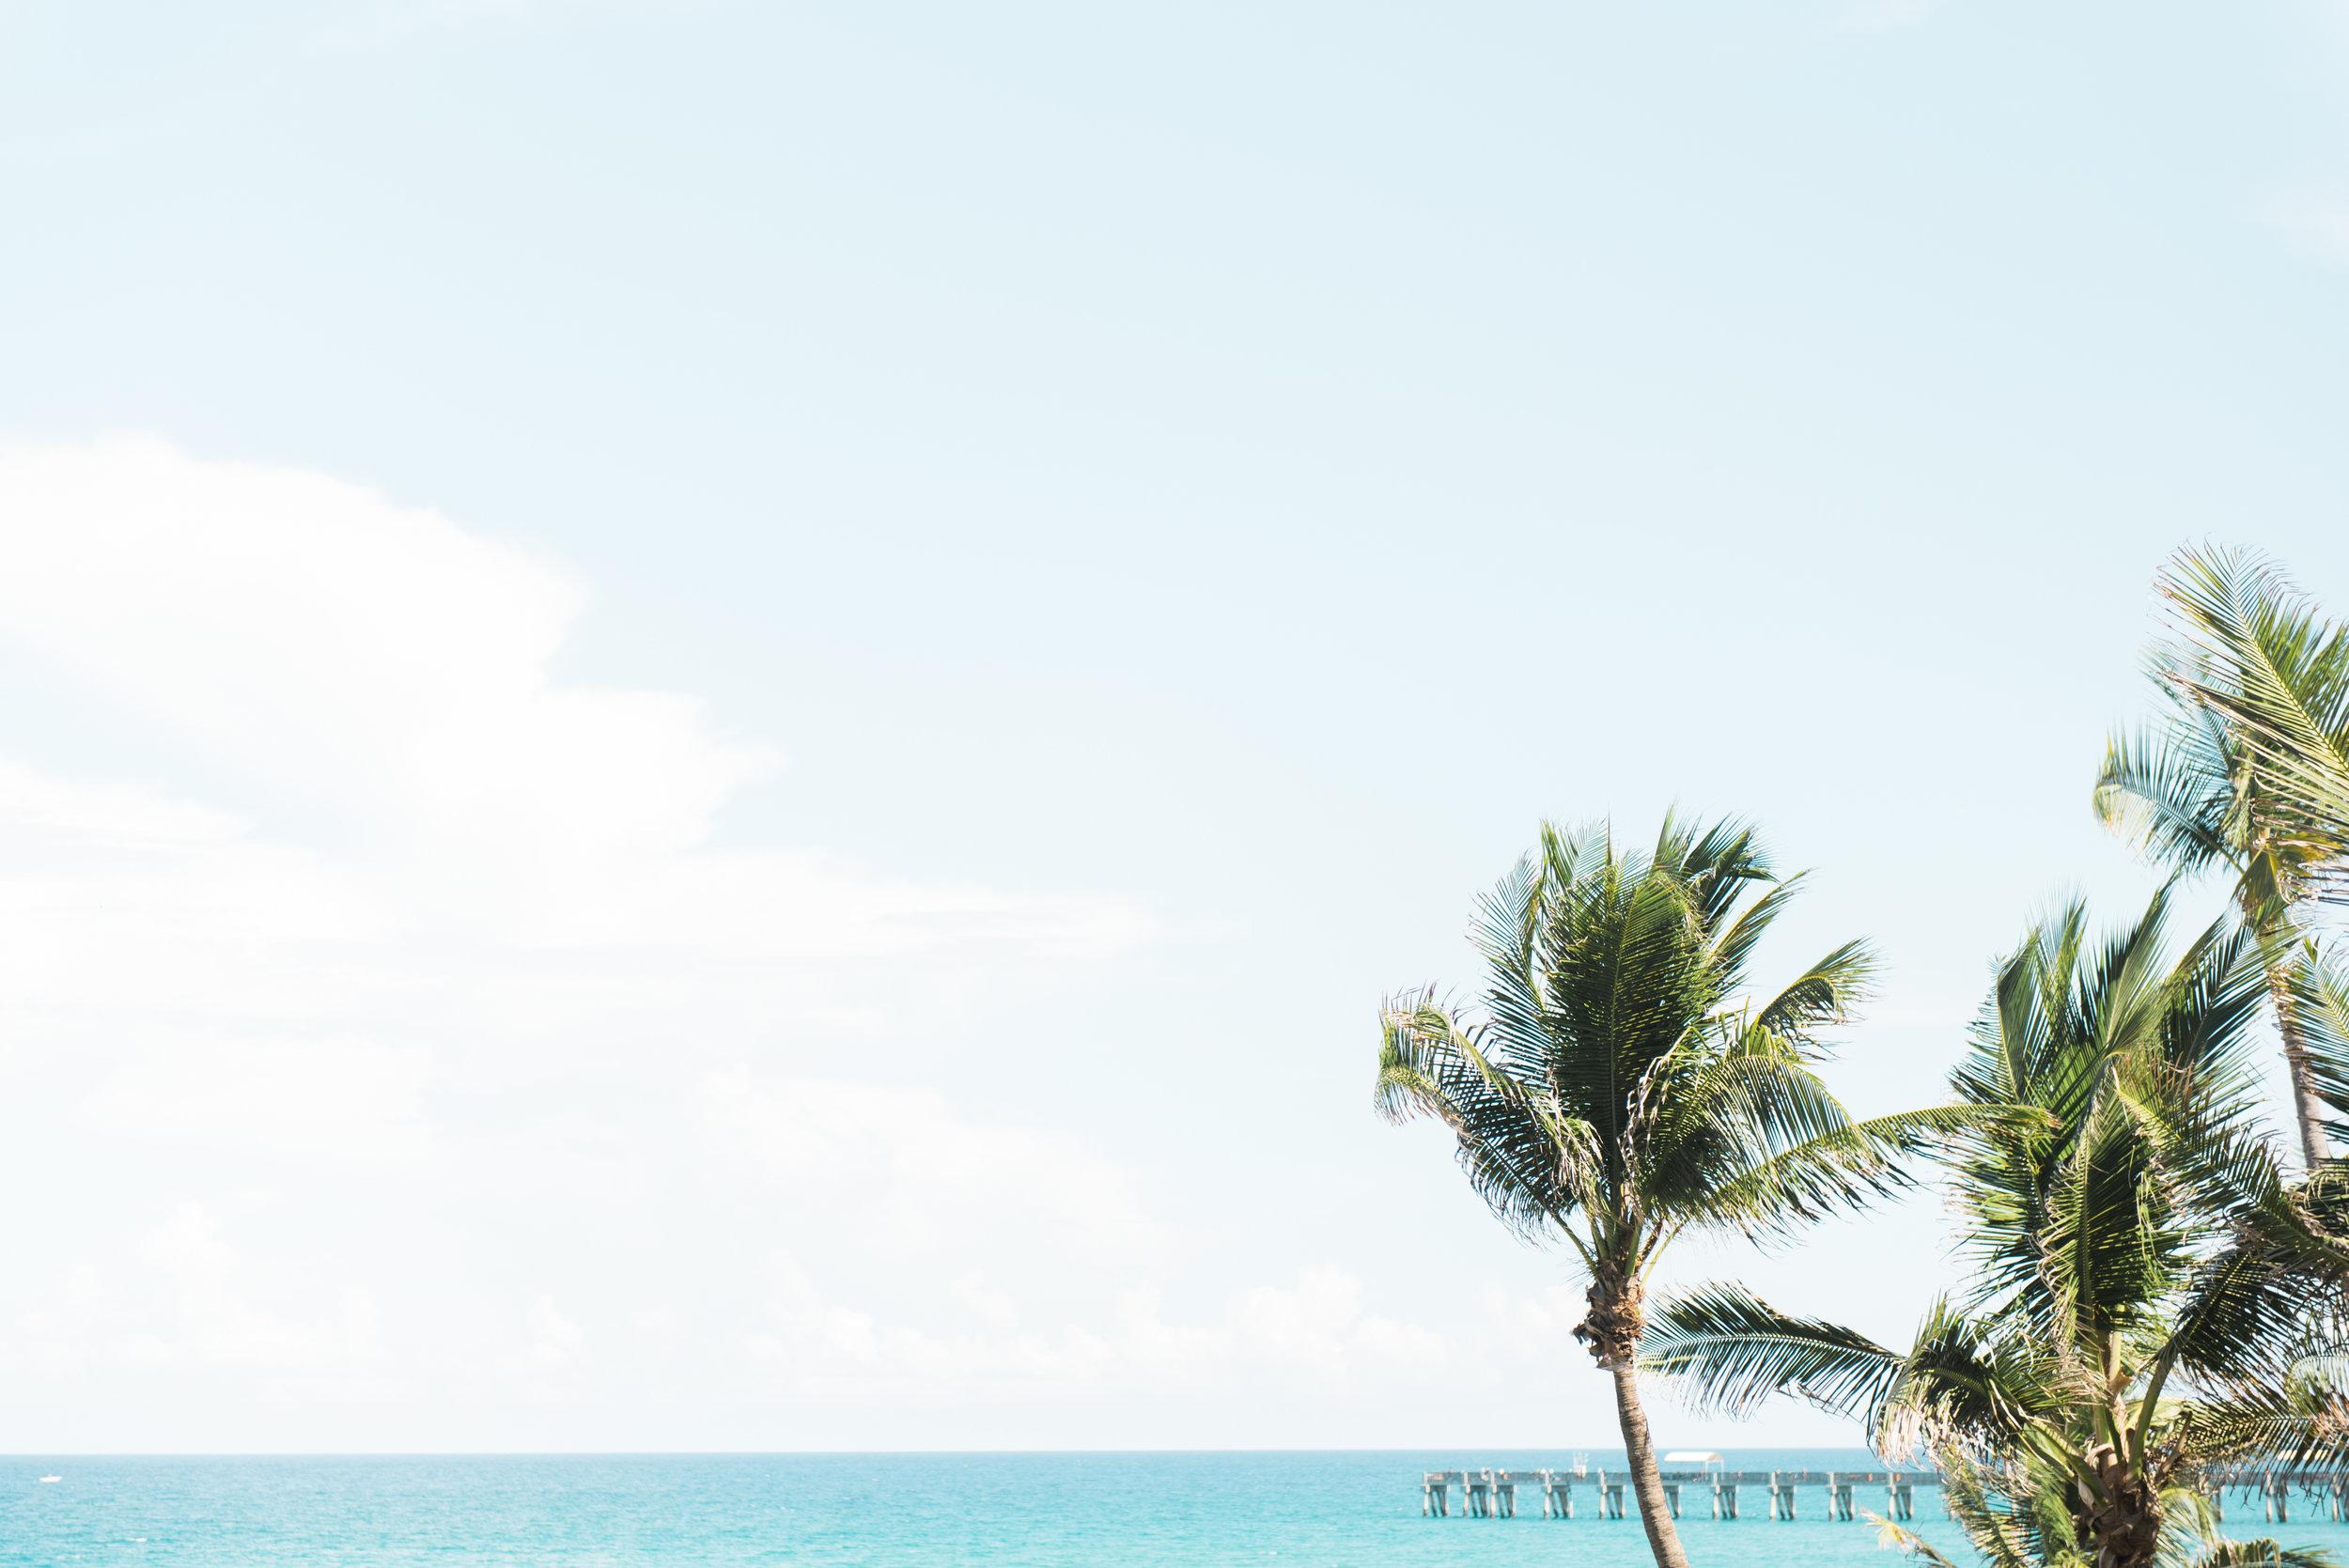 Flagler Museum Palm Beach Wedding Venue - The Overwhelmed Bride Wedding Blog